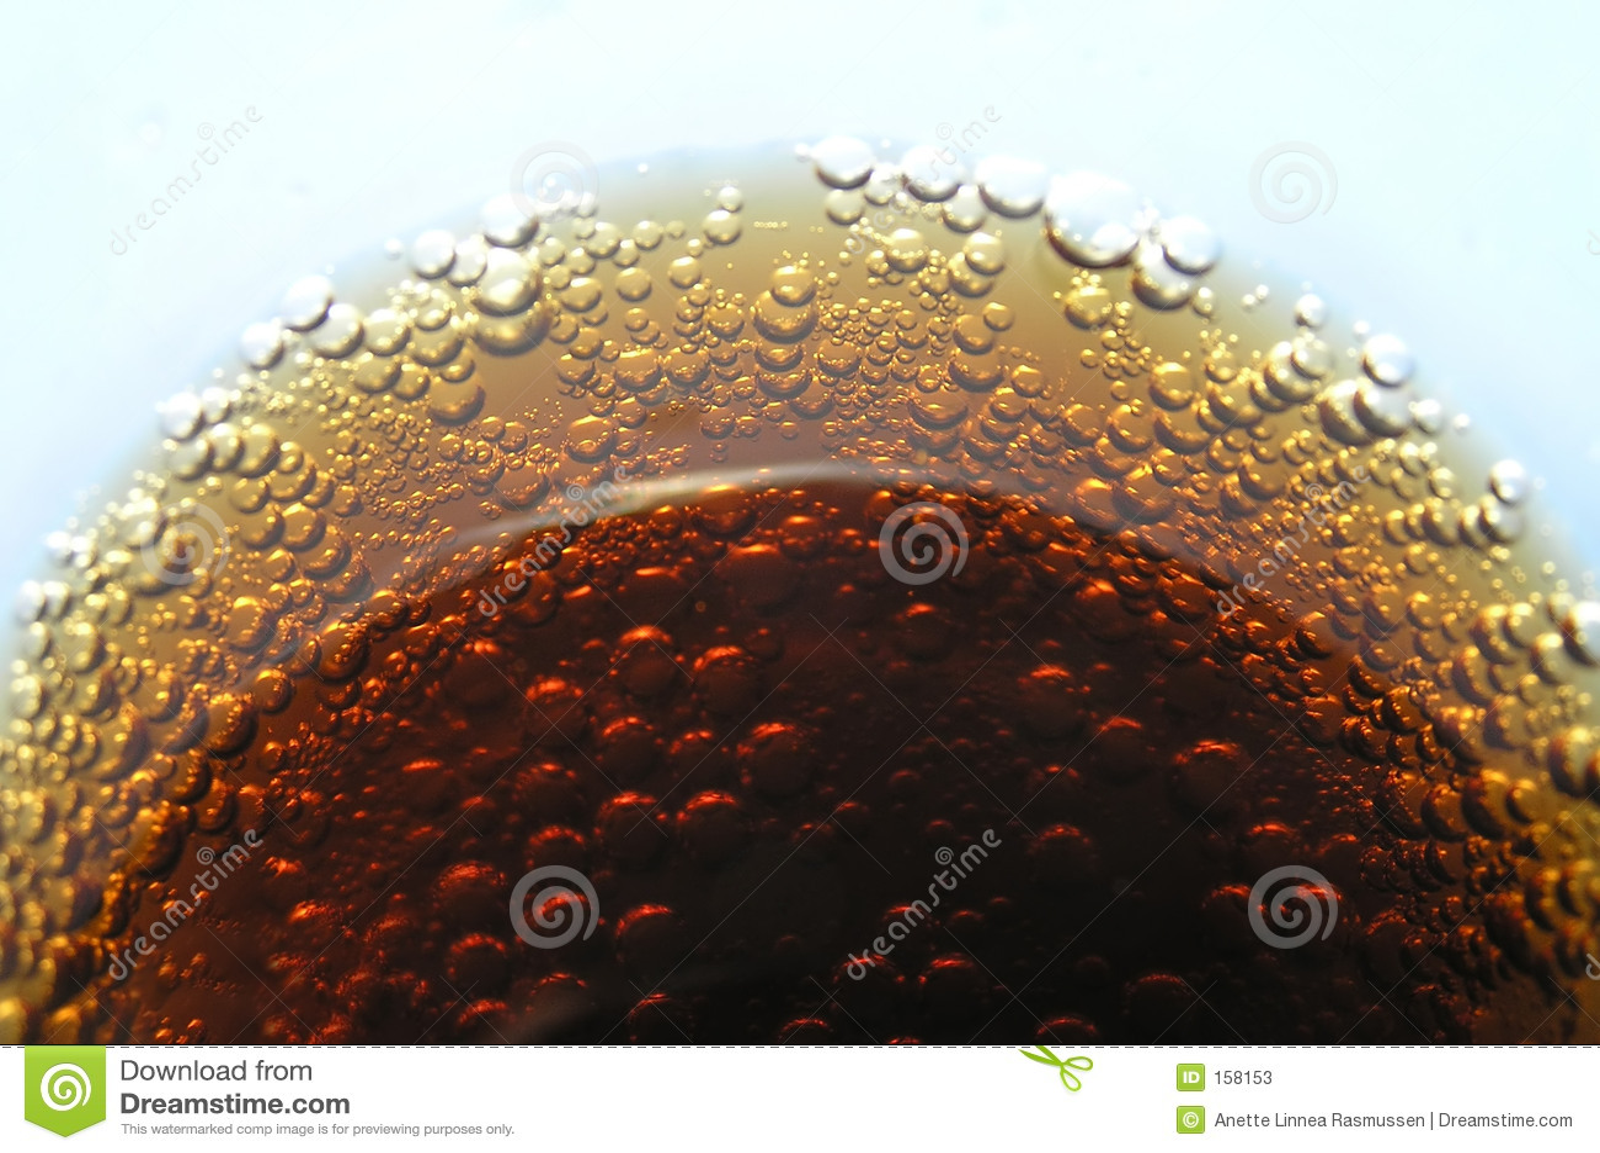 Cola bubbles in glass